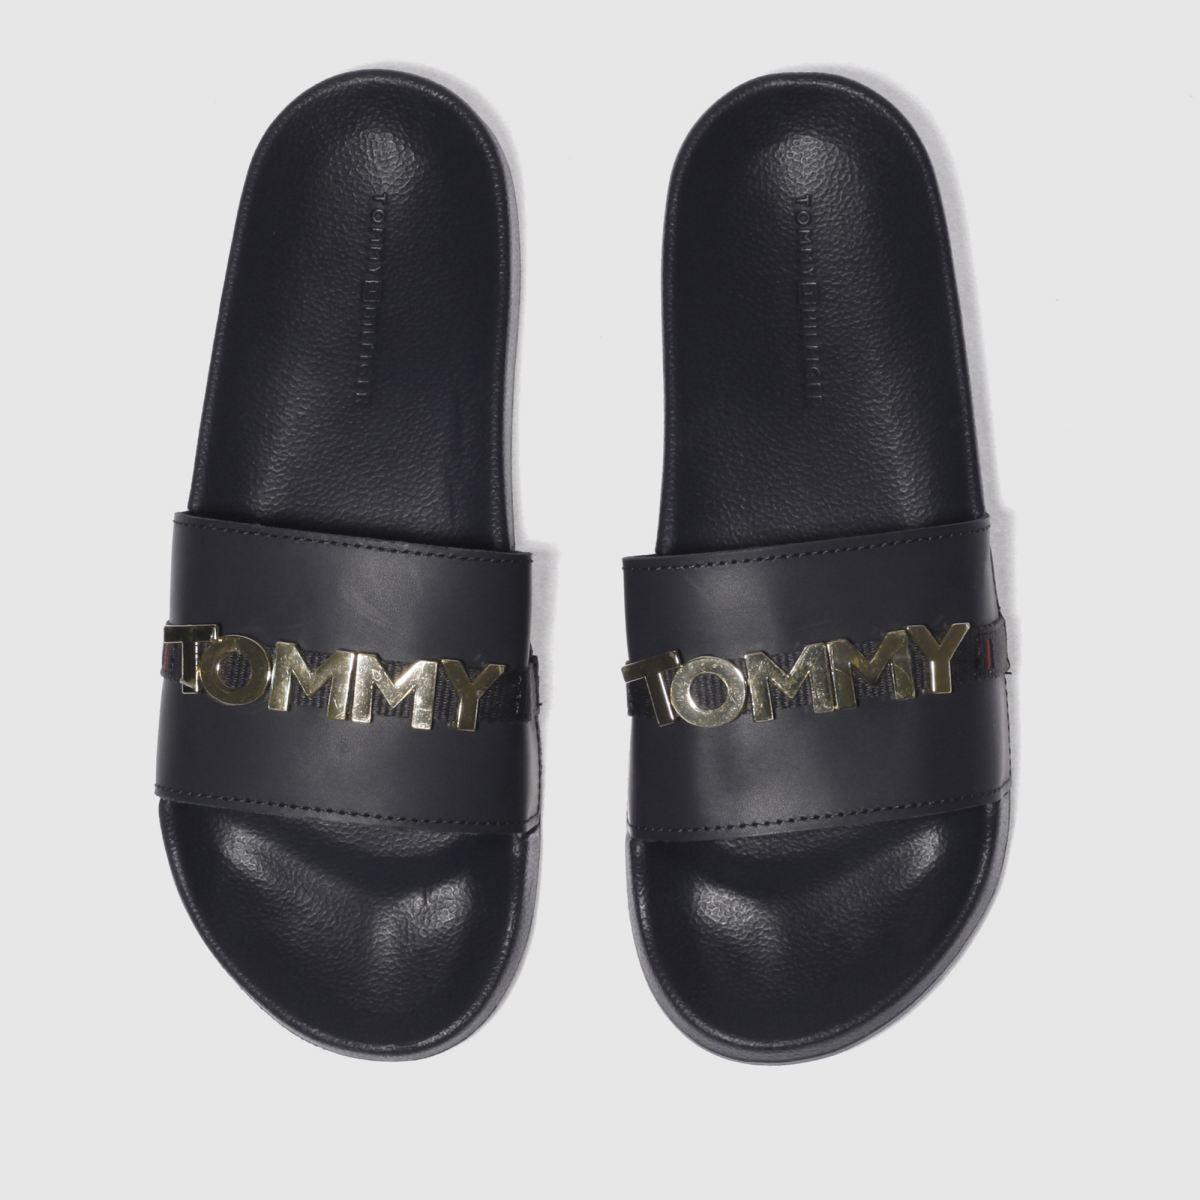 Tommy Hilfiger Tommy Hilfiger Navy & Gold Beach Slide Sandals